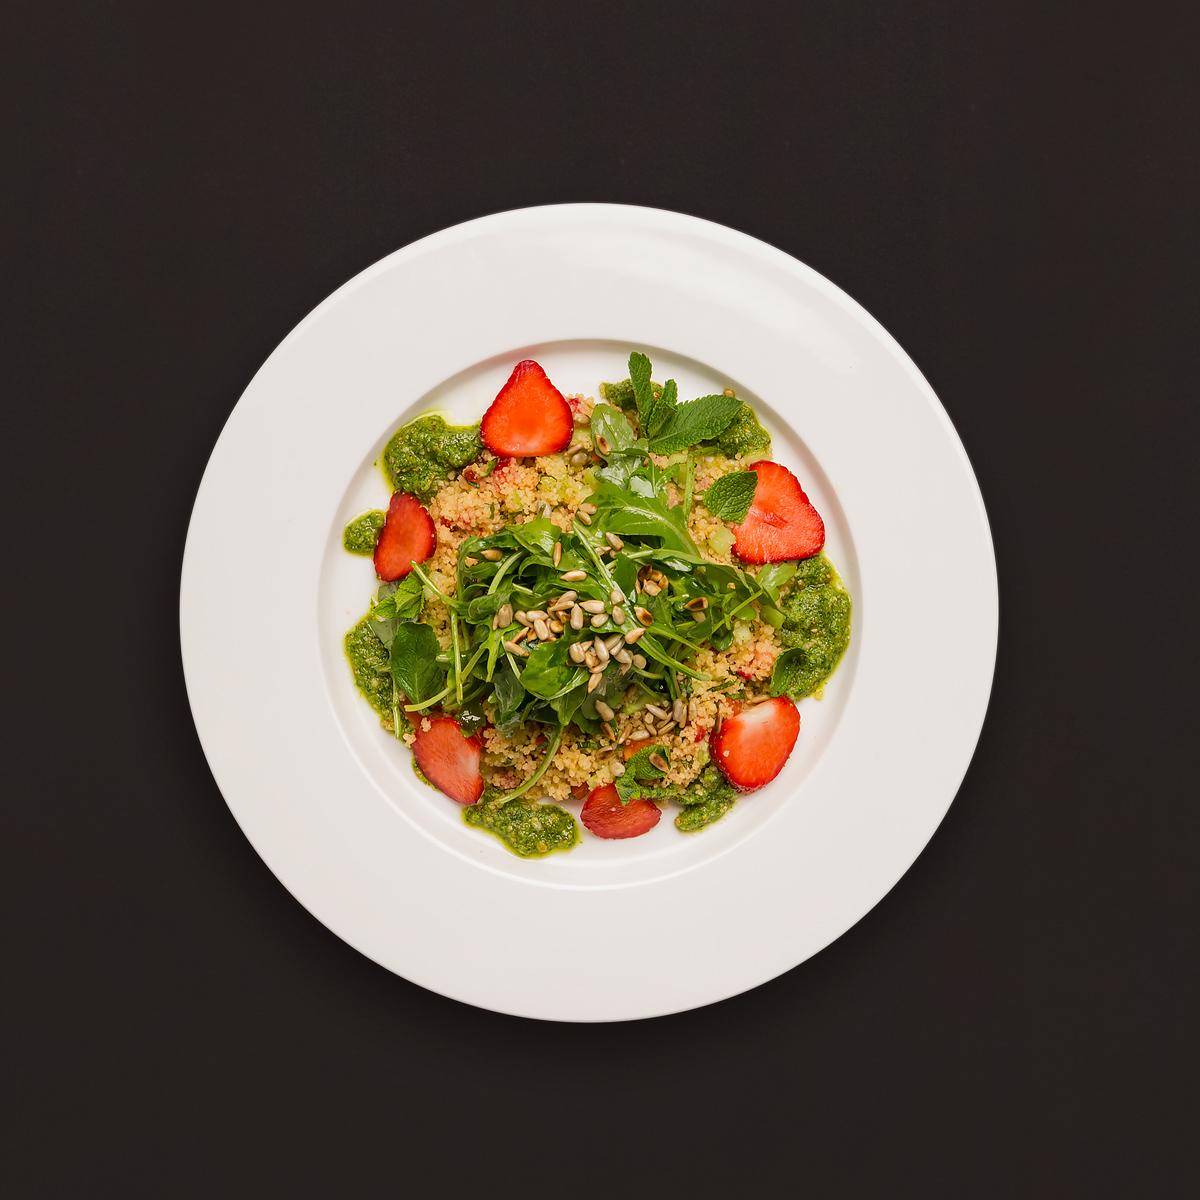 couscous erdbeer salat mit minze und rucolapesto rezept. Black Bedroom Furniture Sets. Home Design Ideas